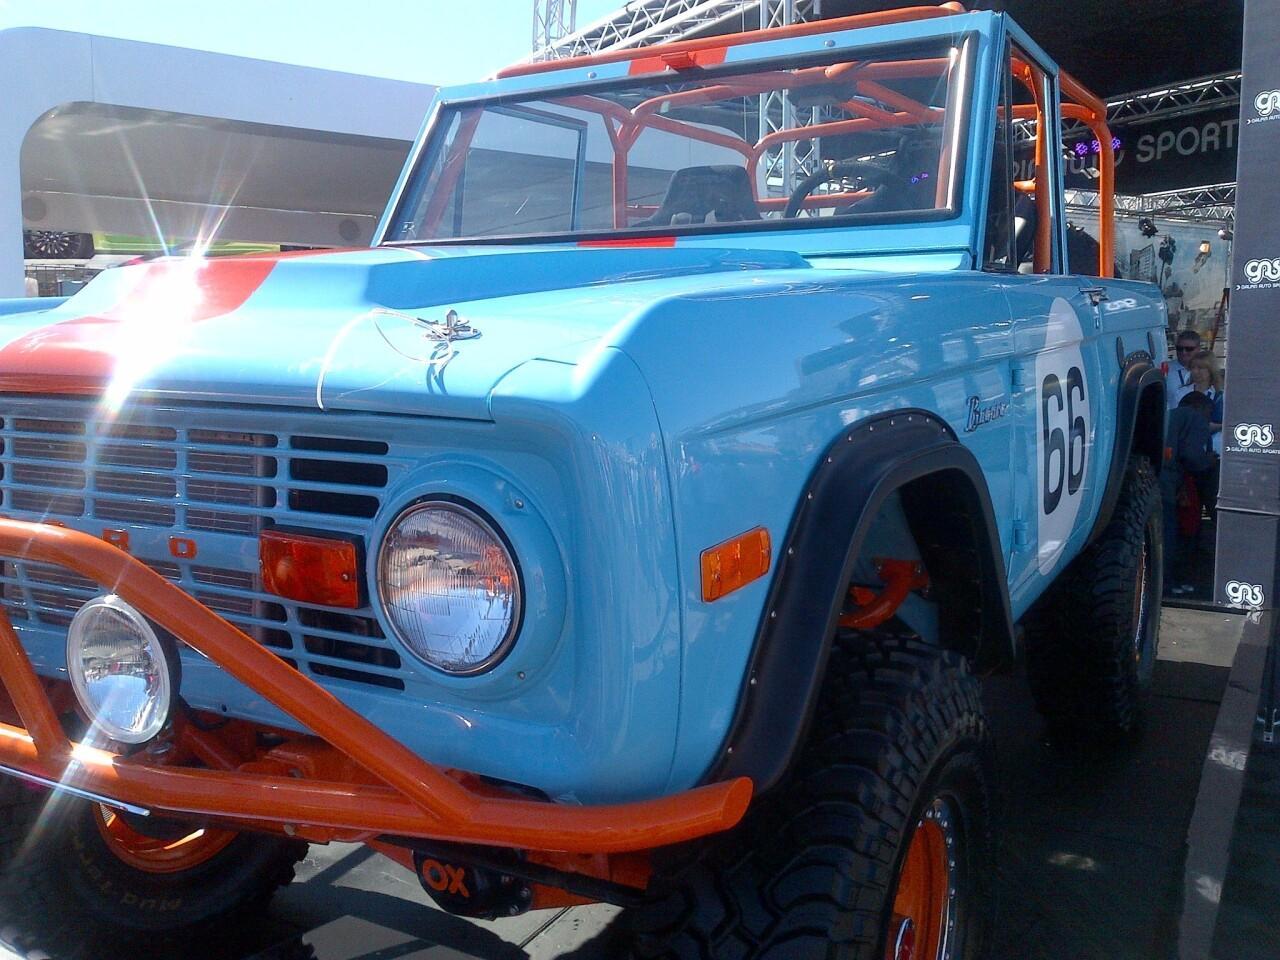 Galpin Auto Sports SEMA cars